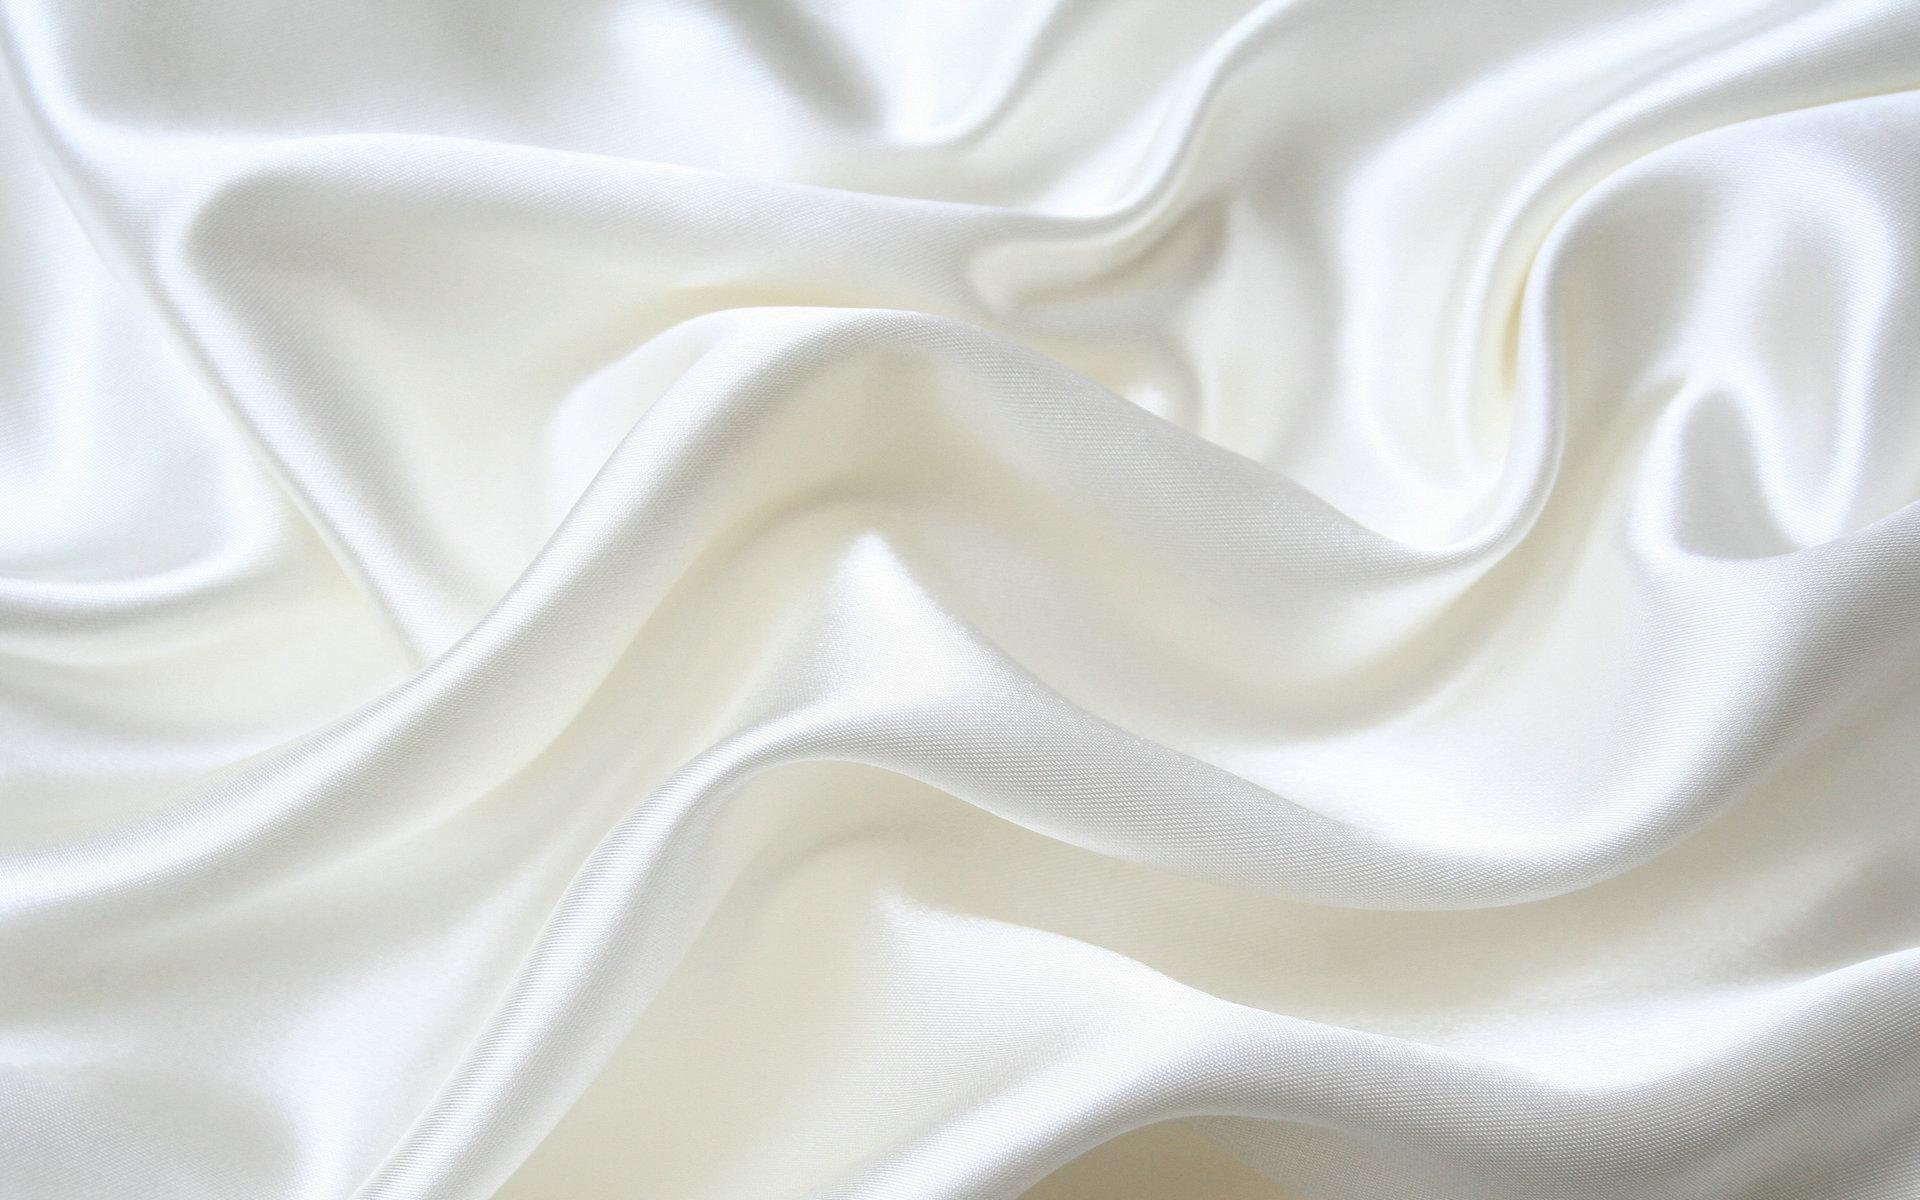 Free Silk Wallpaper 26460 1728x1080 px